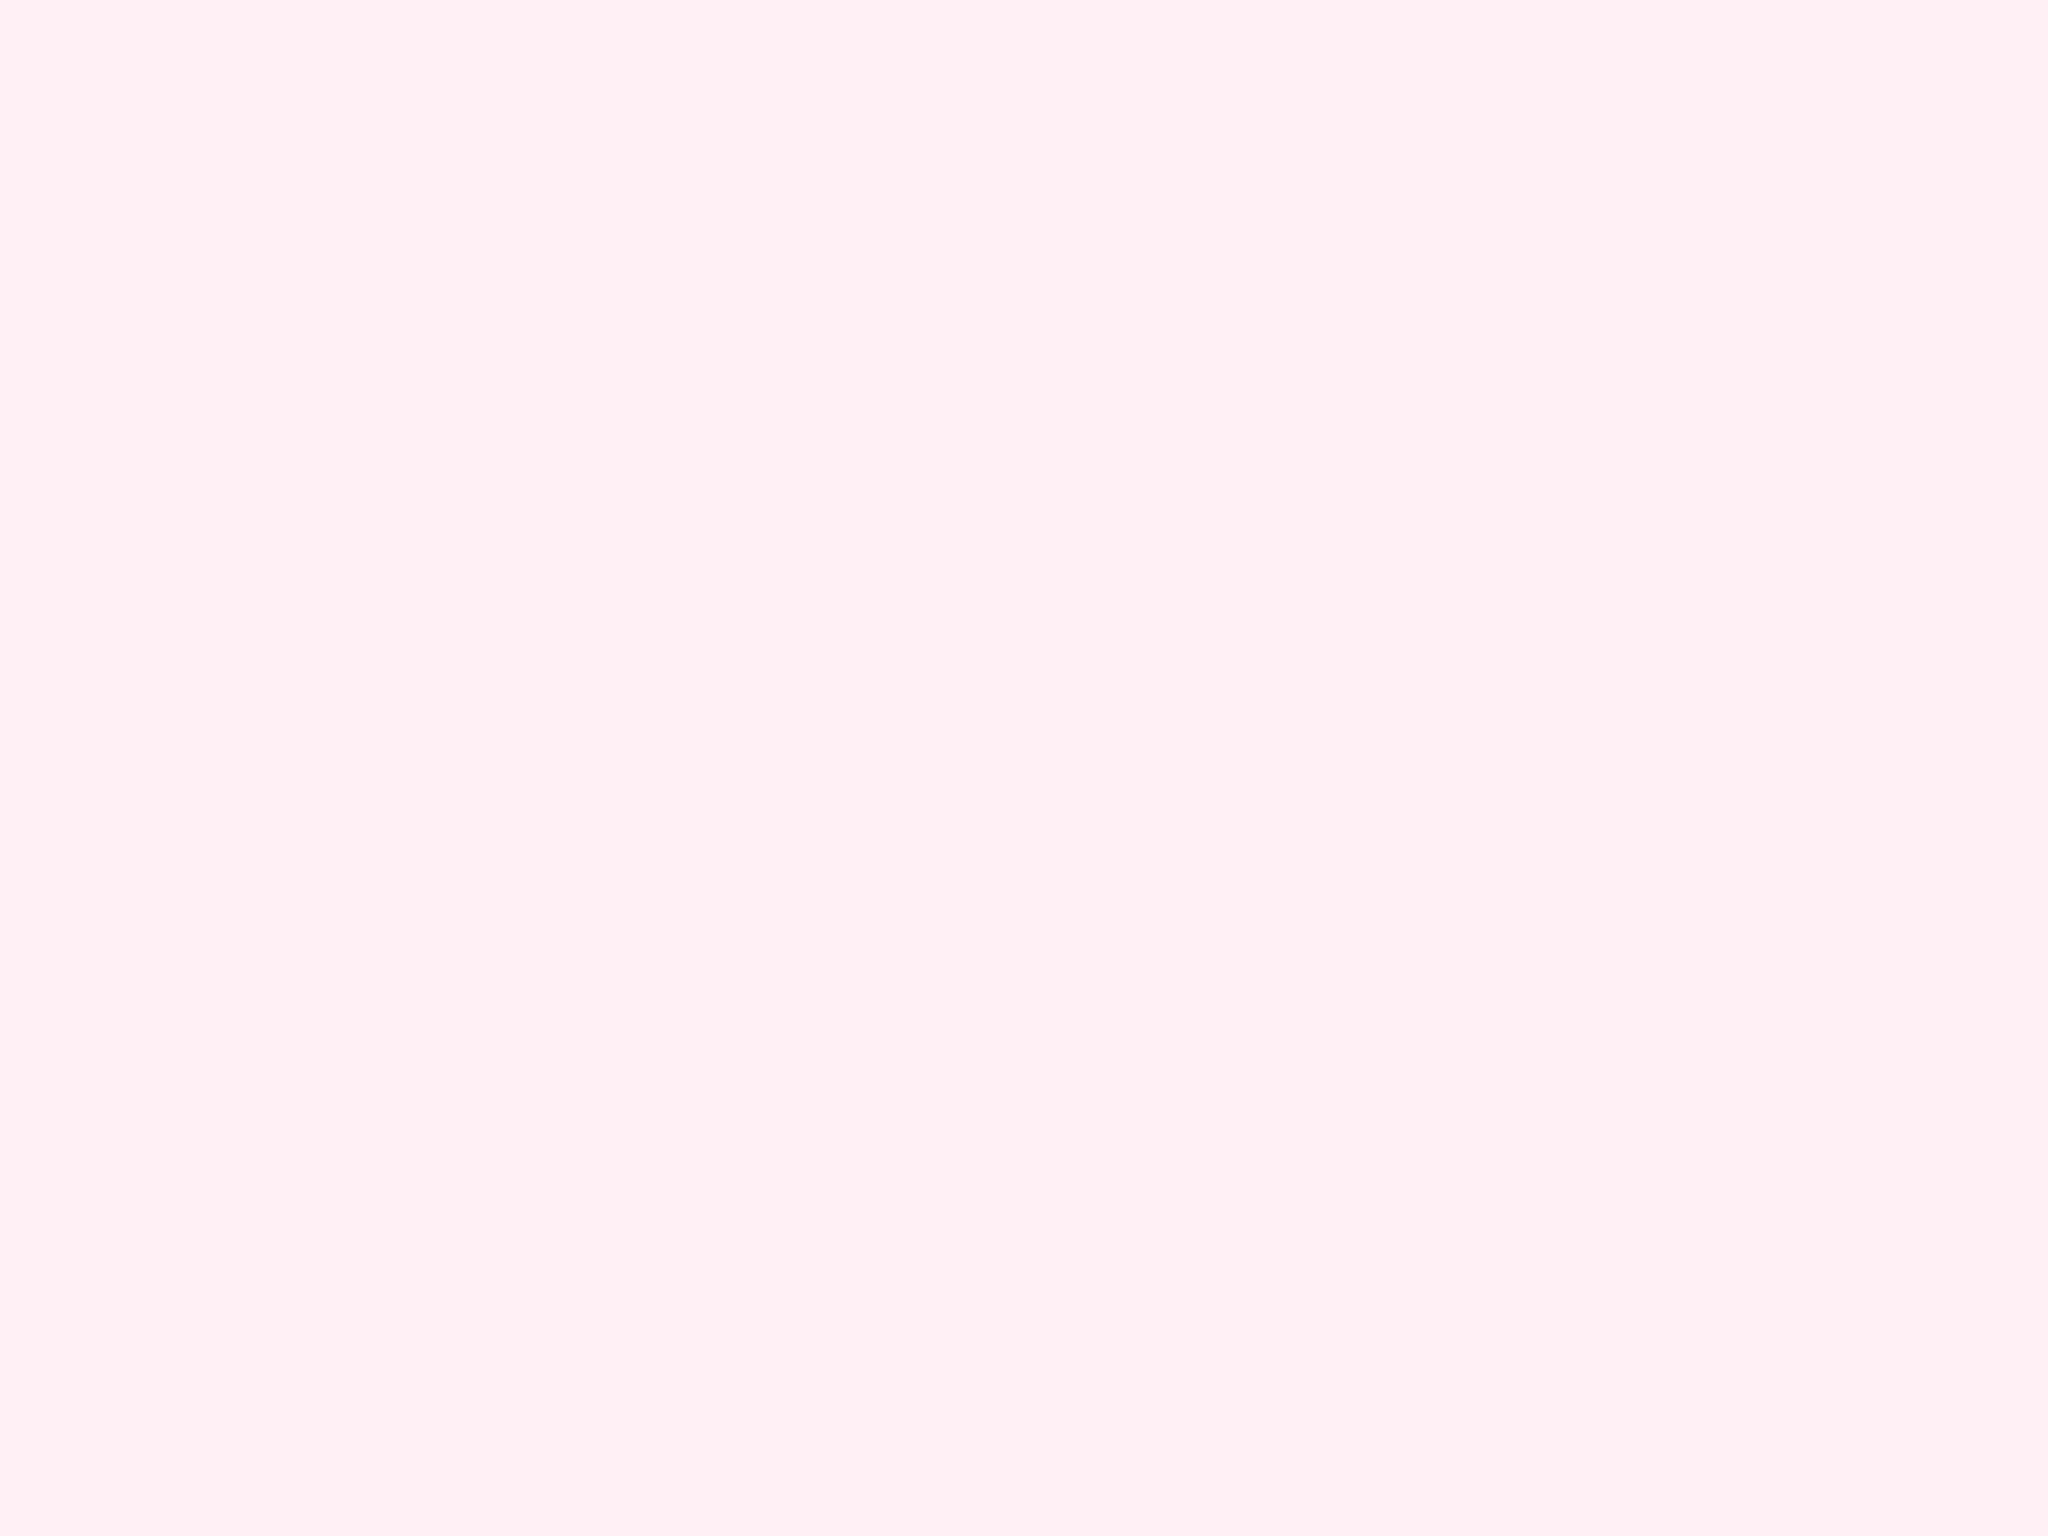 2048x1536 Lavender Blush Solid Color Background